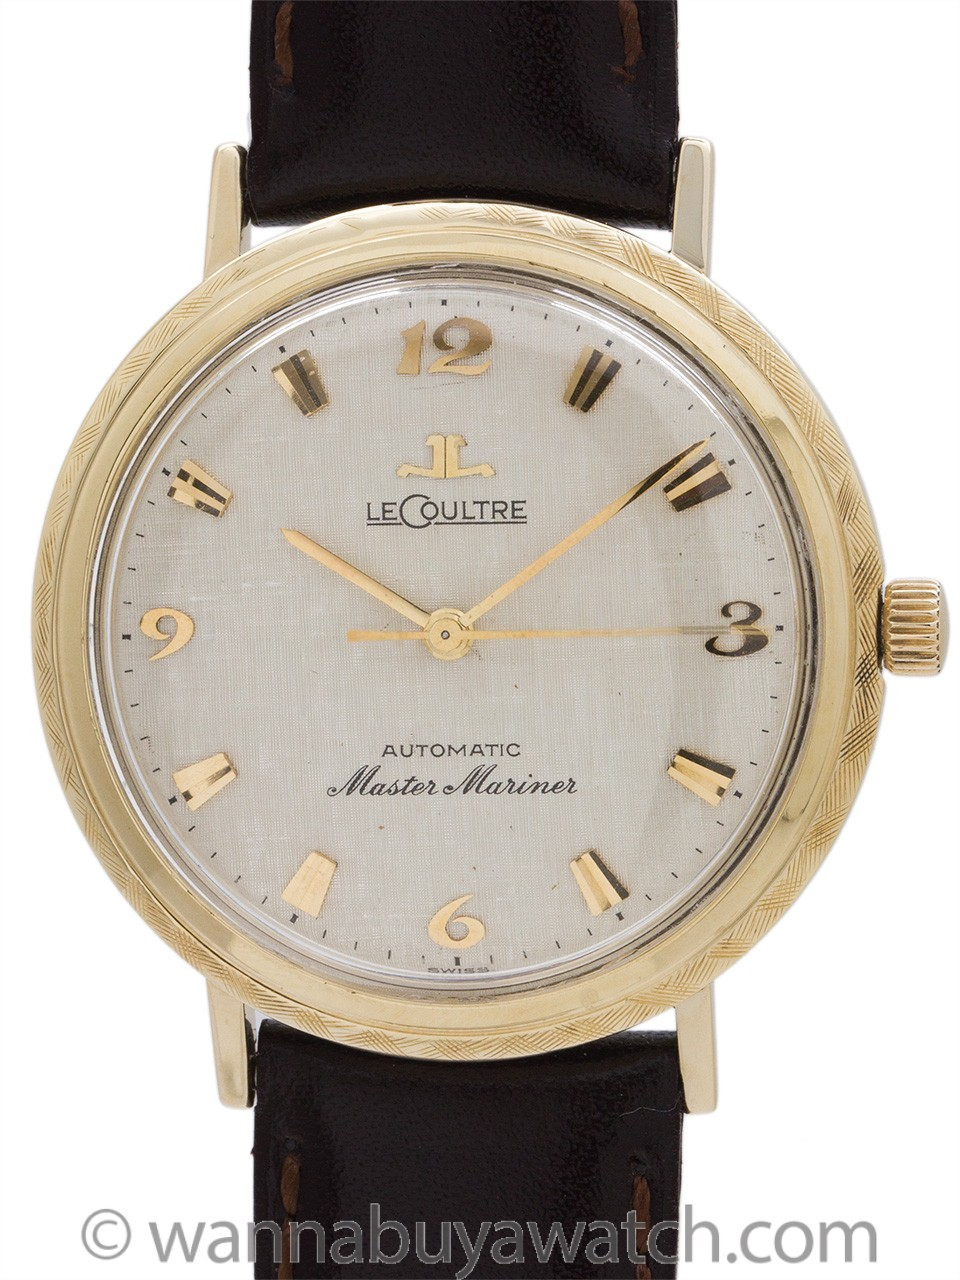 Lecoultre Master Mariner Automatic 14K circa 1960's